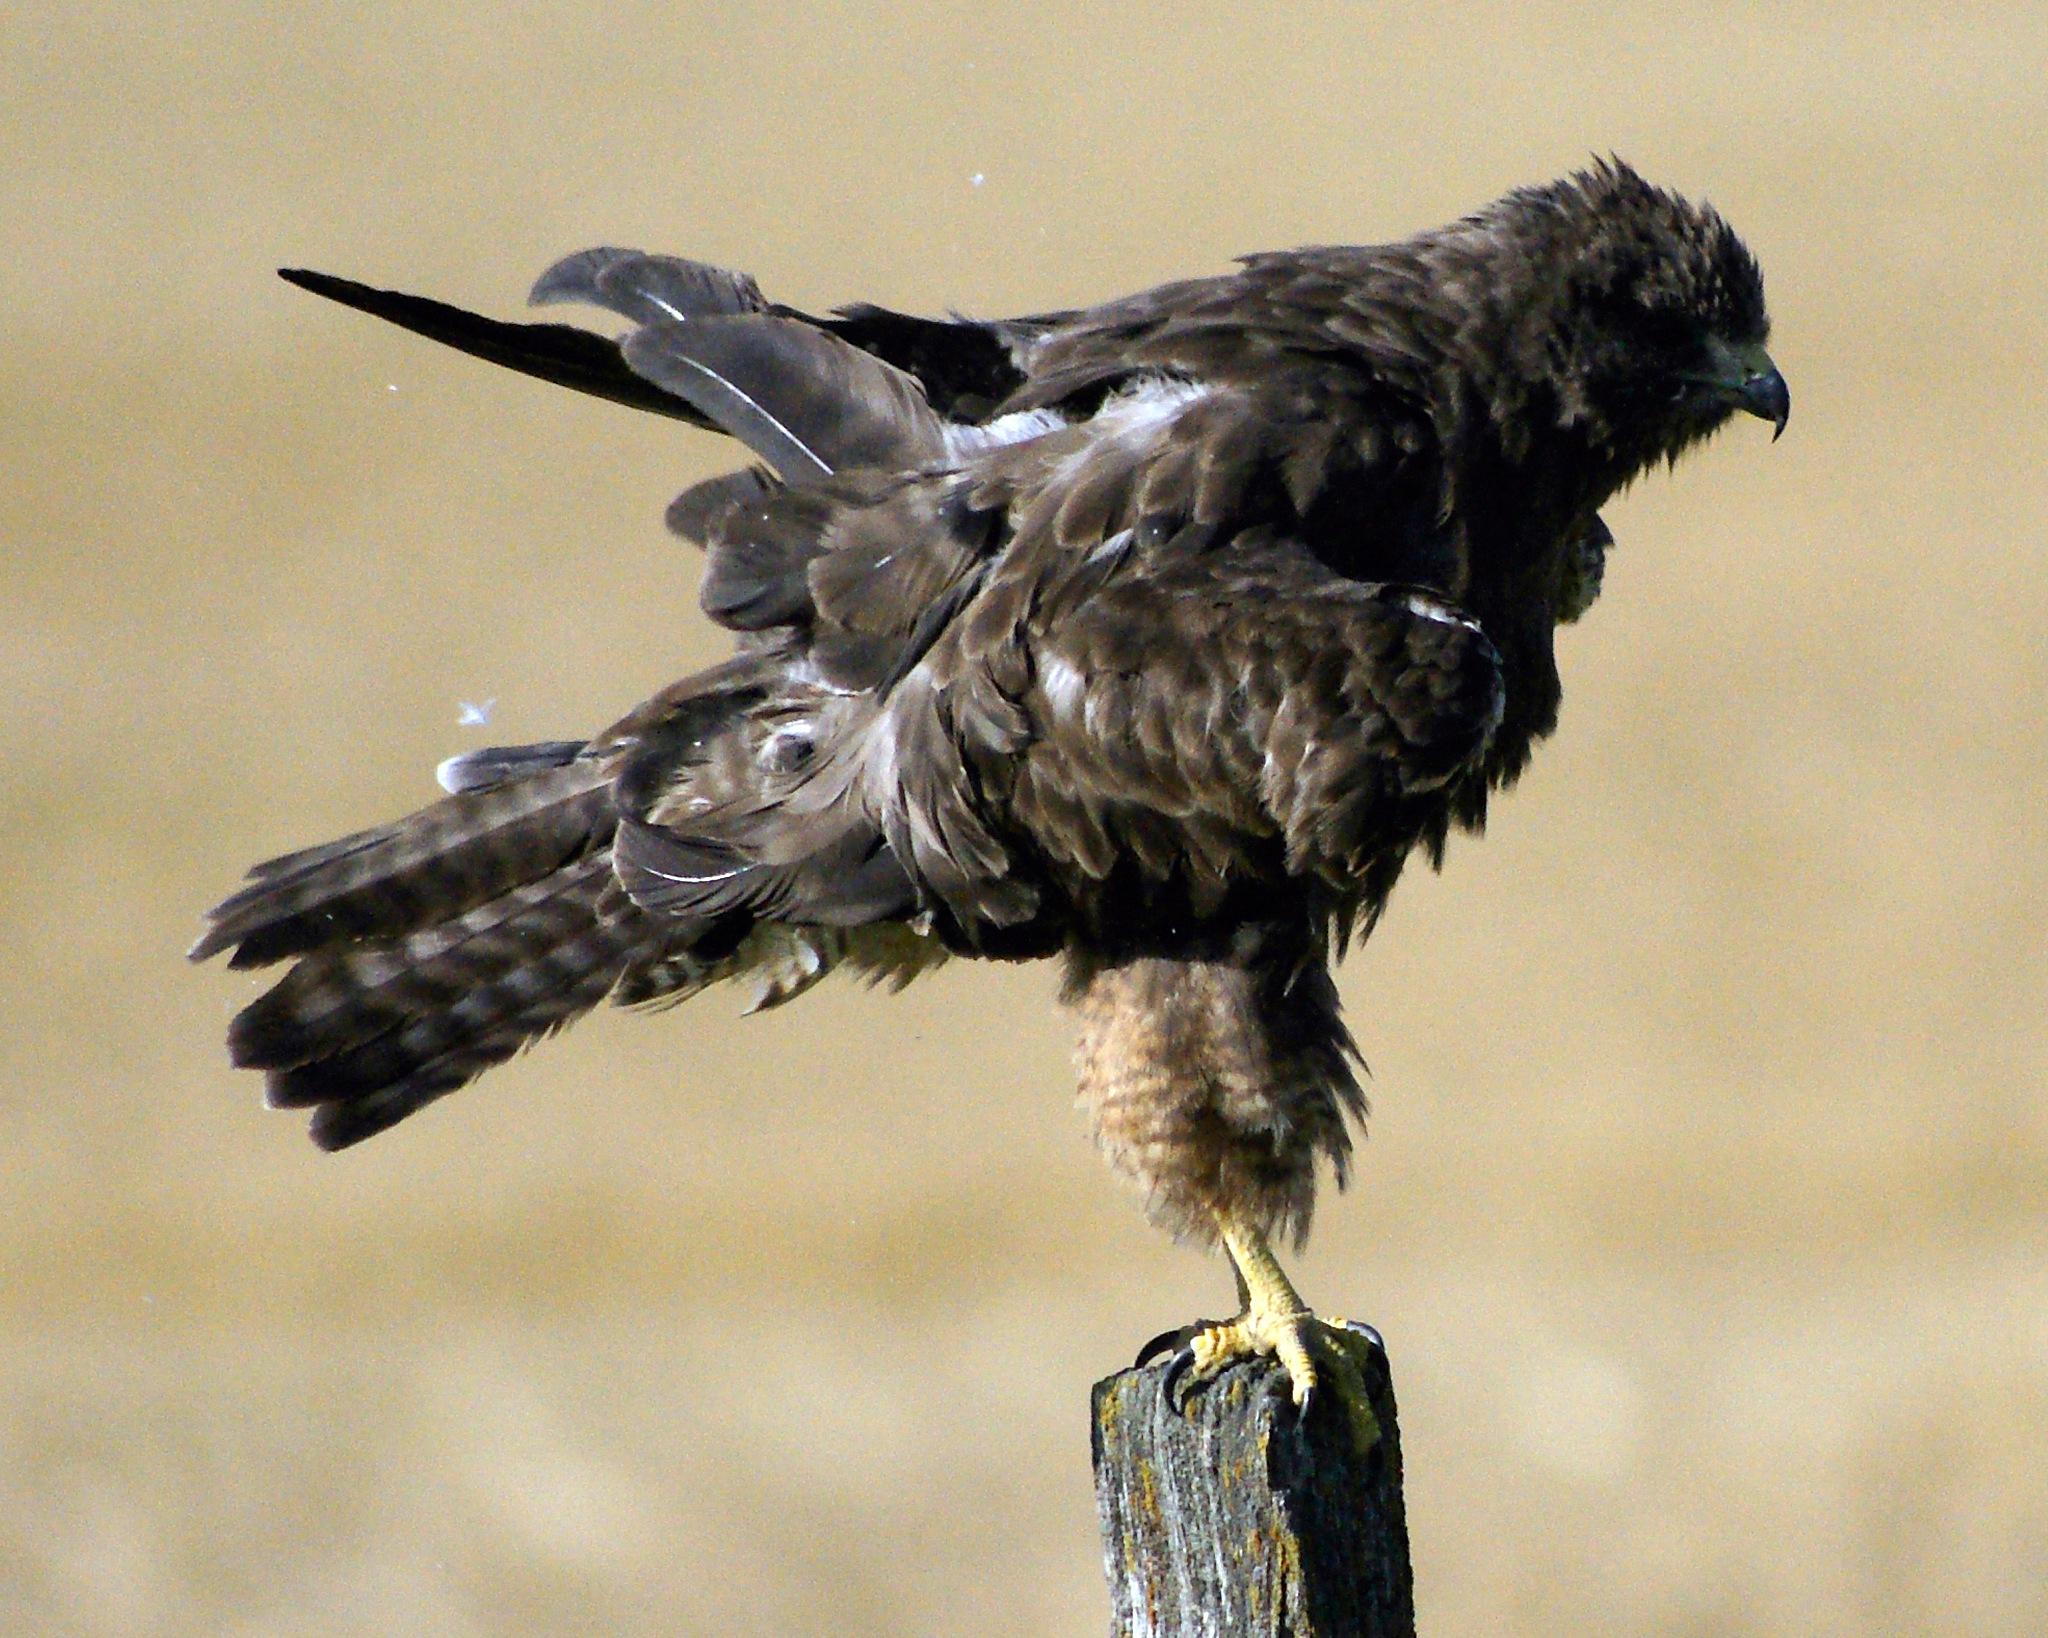 Hawk dusting by volvoman98